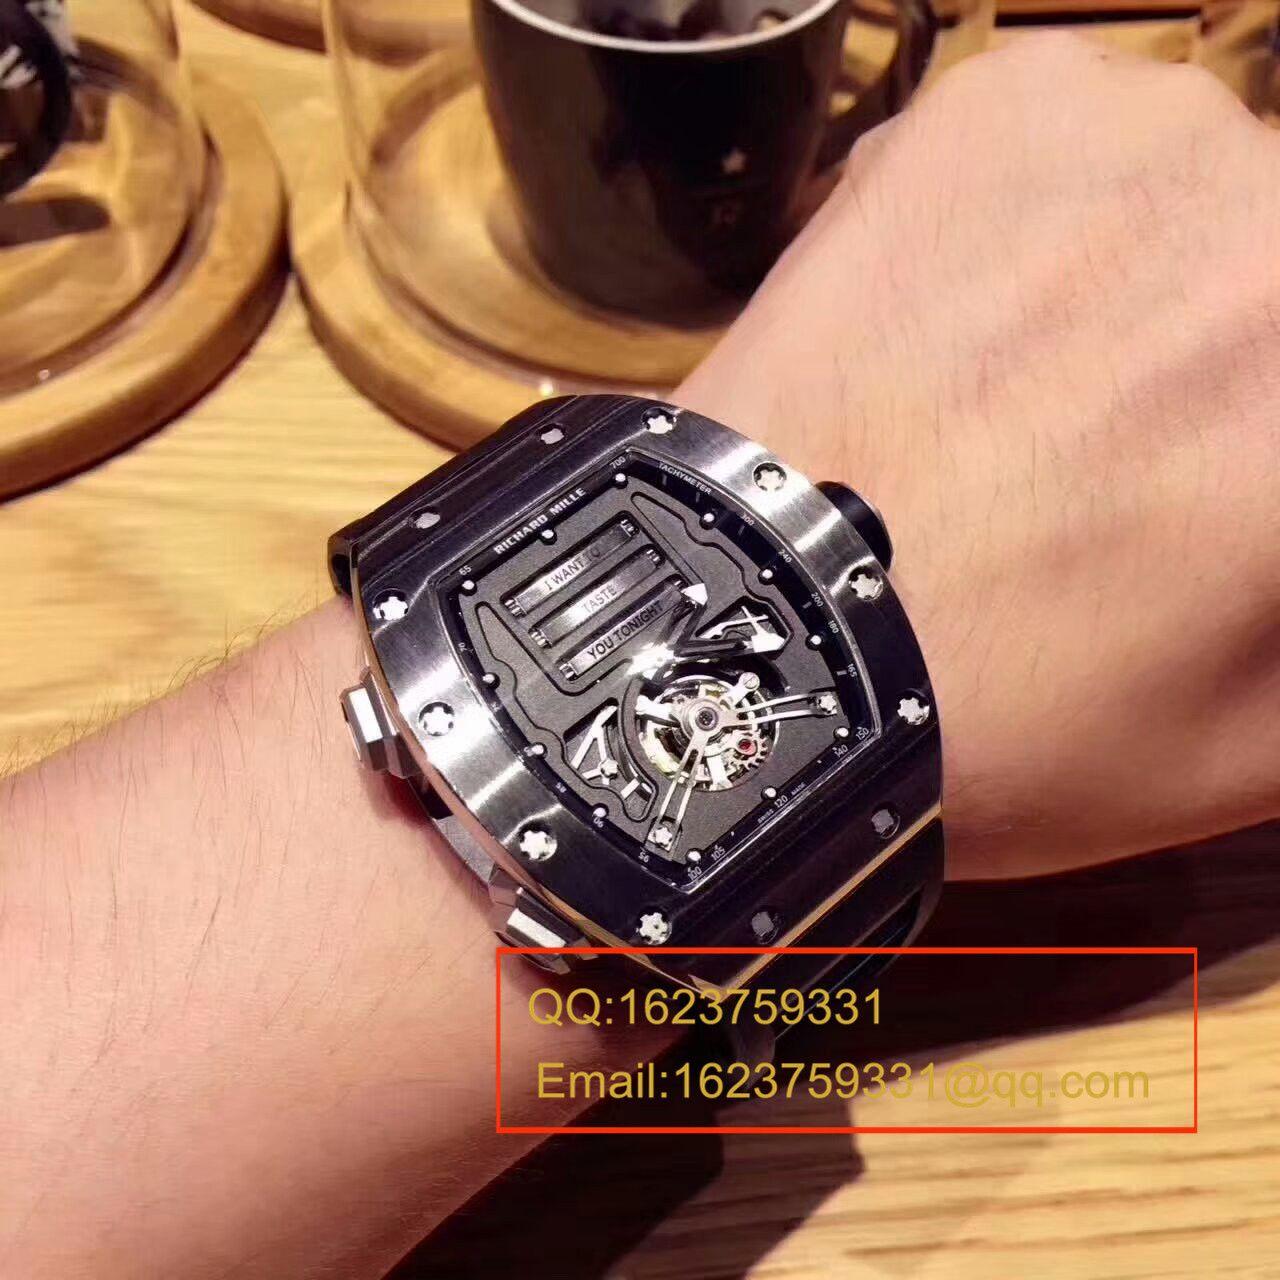 【RM顶级复刻手表】理查德.米勒男士系列RM 69Ti情色腕表 / RM 69Ti